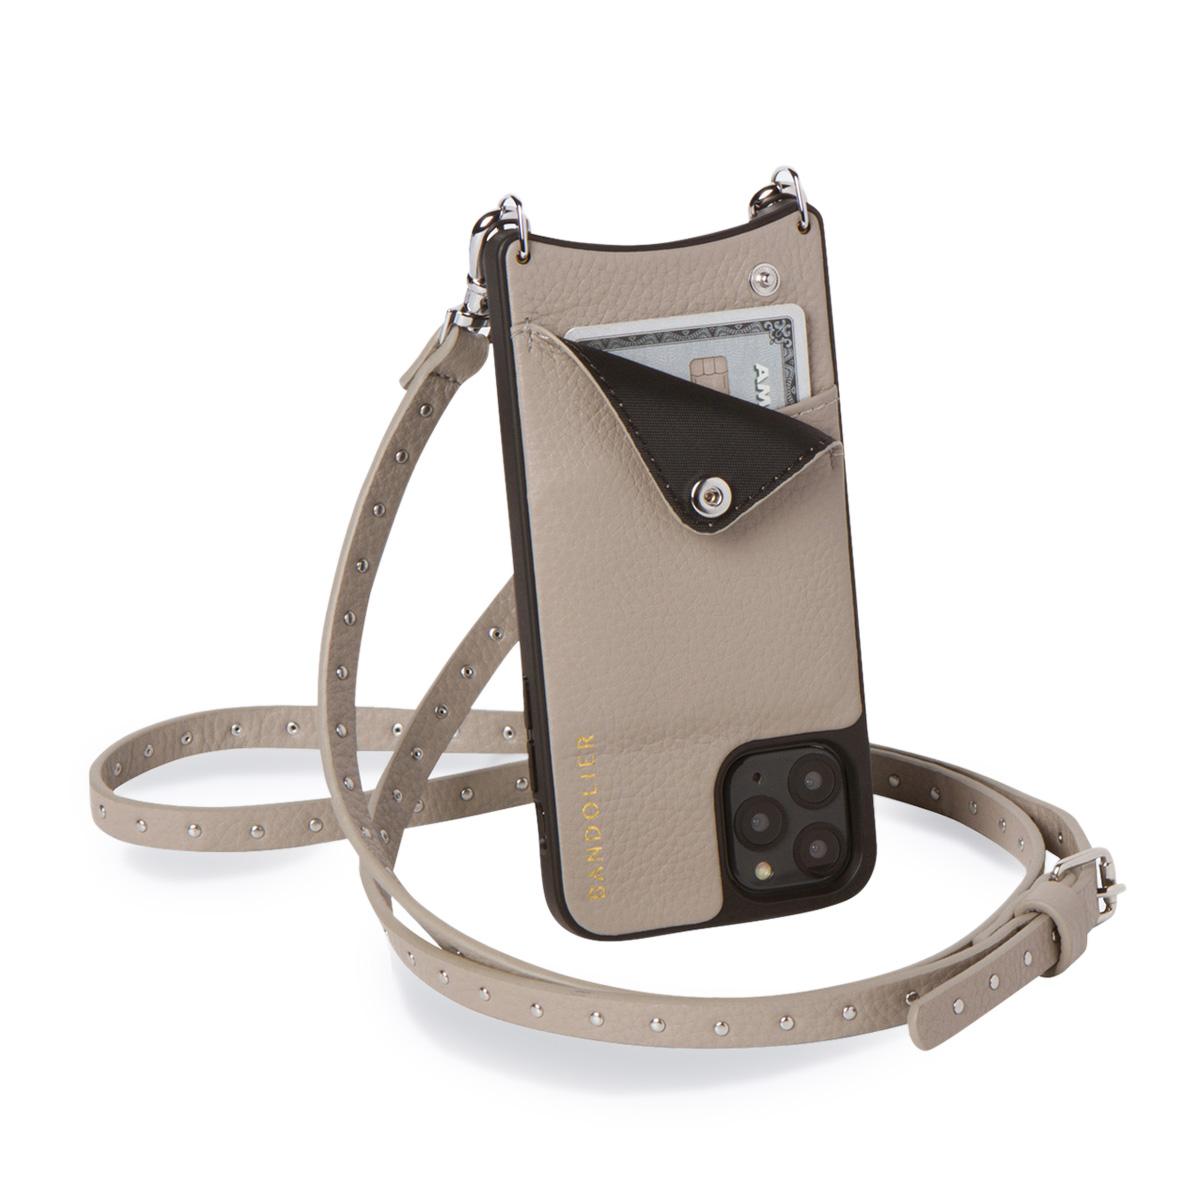 BANDOLIER NICOLE GREGE バンドリヤー iPhoneXS X ケース スマホ 携帯 ショルダー アイフォン メンズ レディース レザー グレー 10NIC